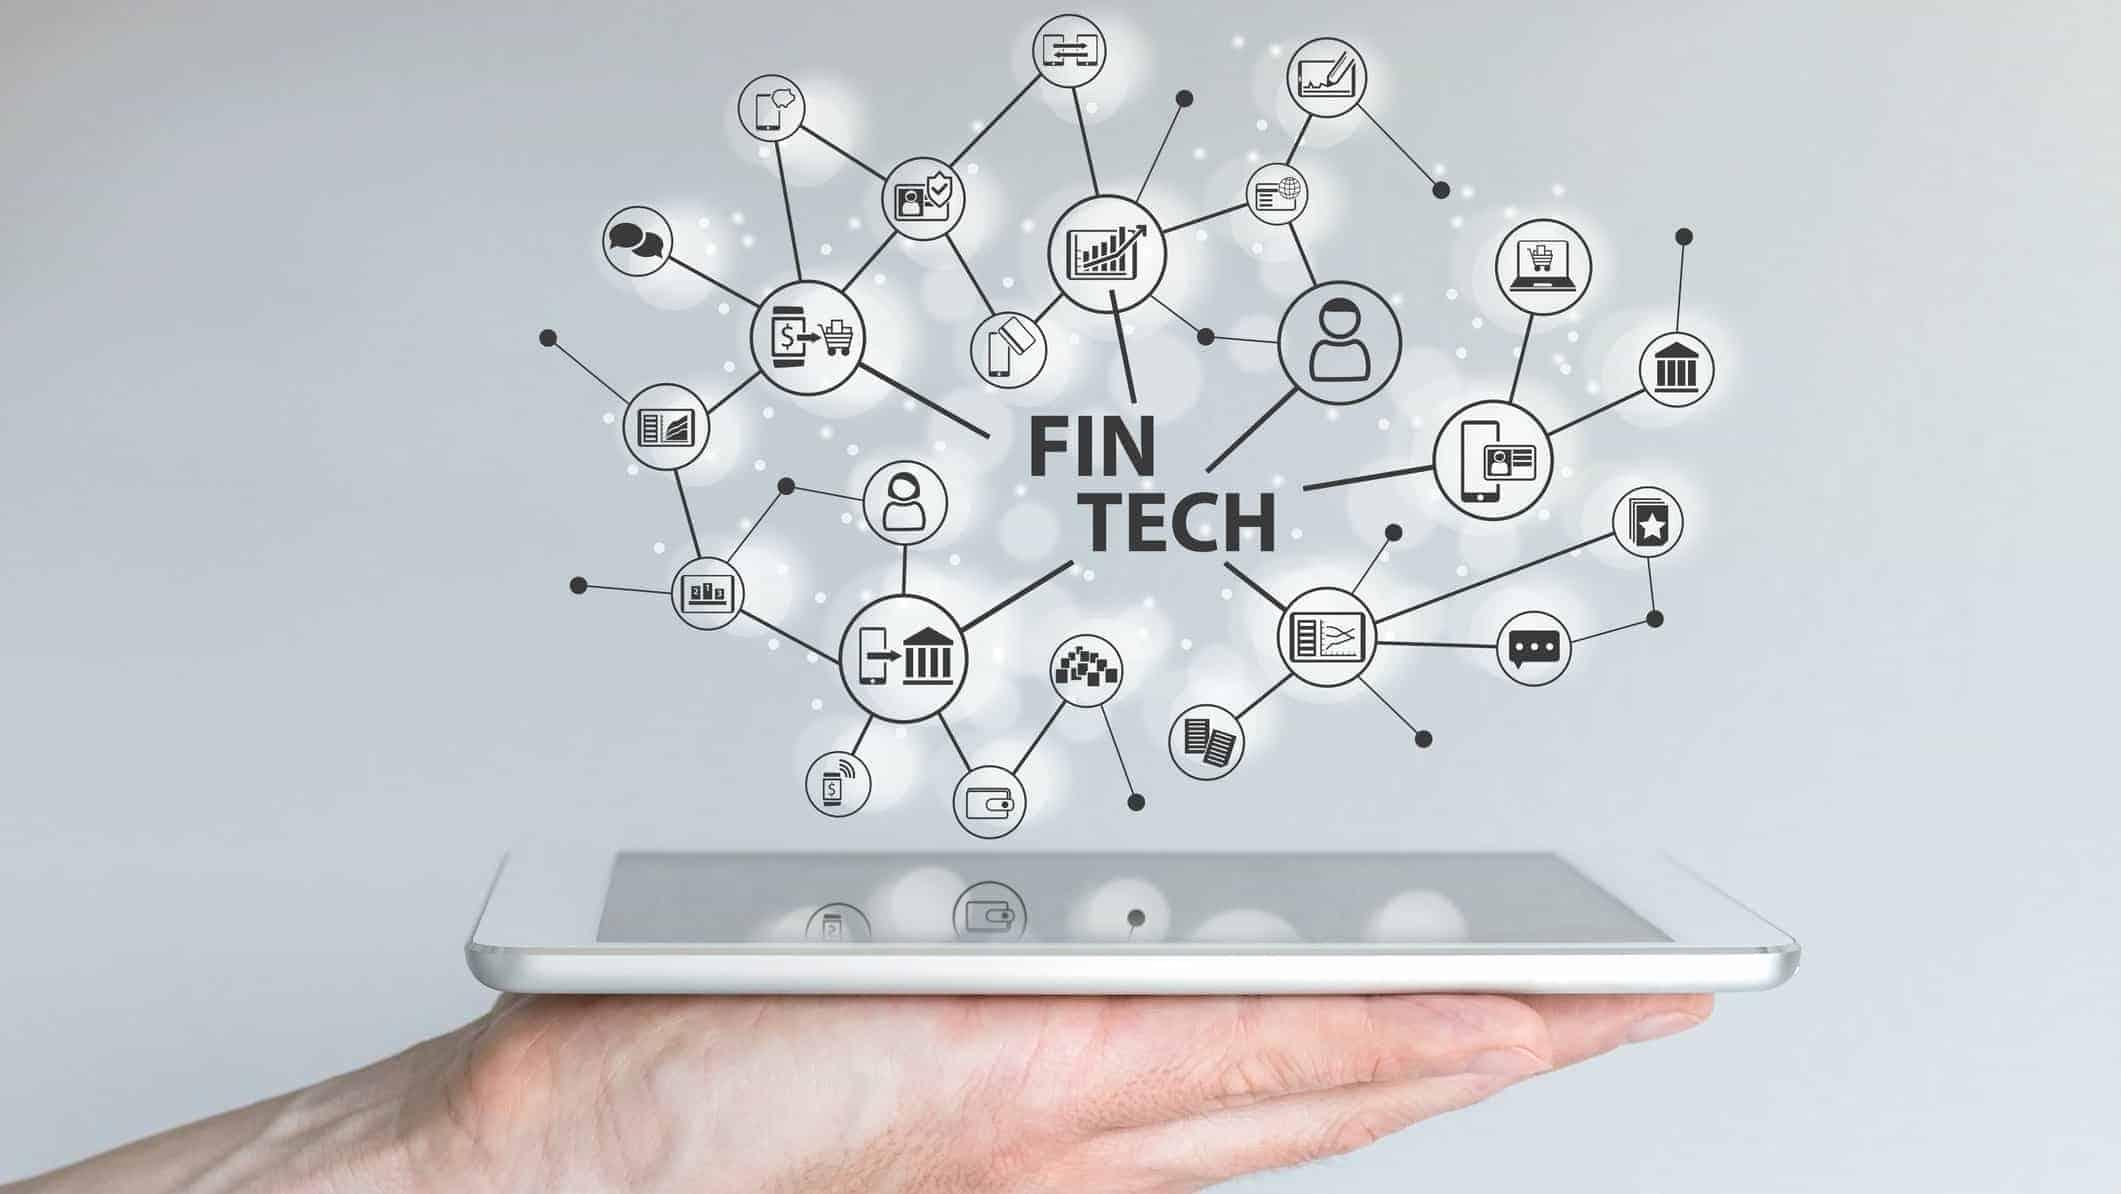 Nigerian Fintech: TeamApt to Expand to Latin America